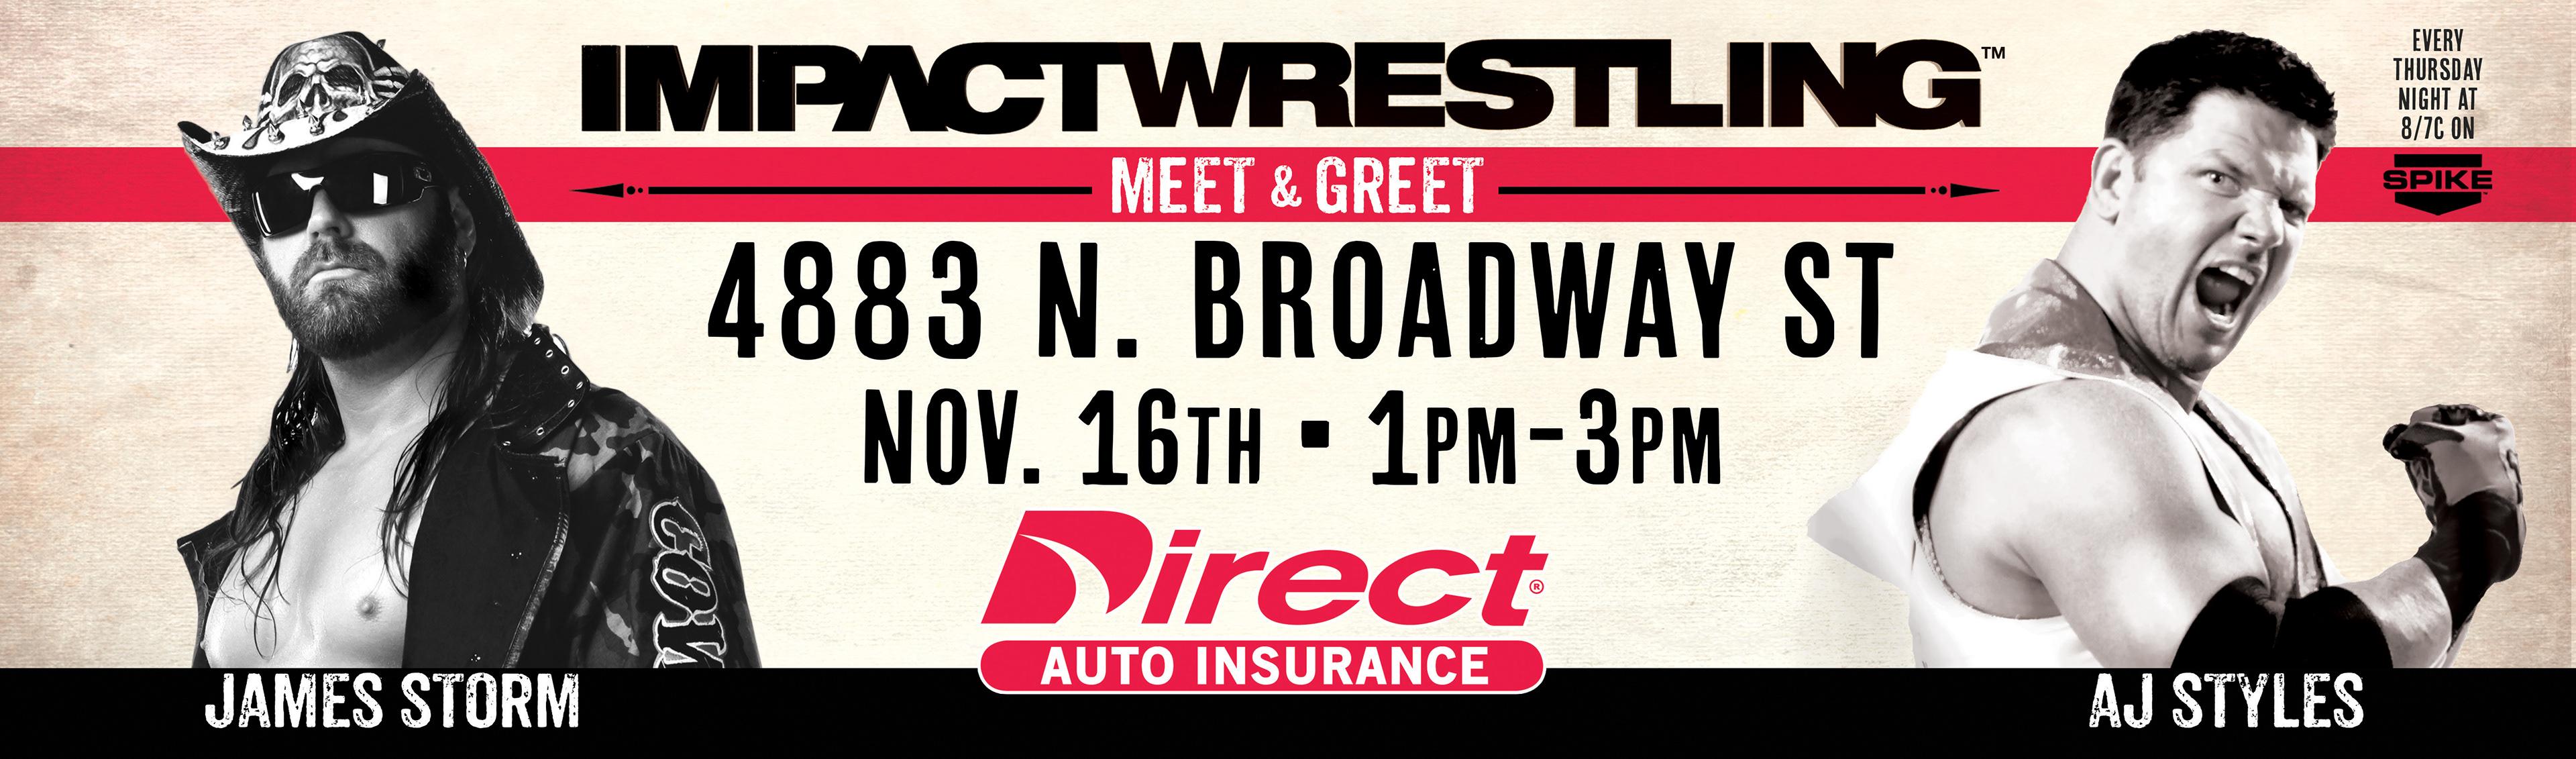 Erik Edmondson Impact Wresting Billboard Ads For Direct Auto